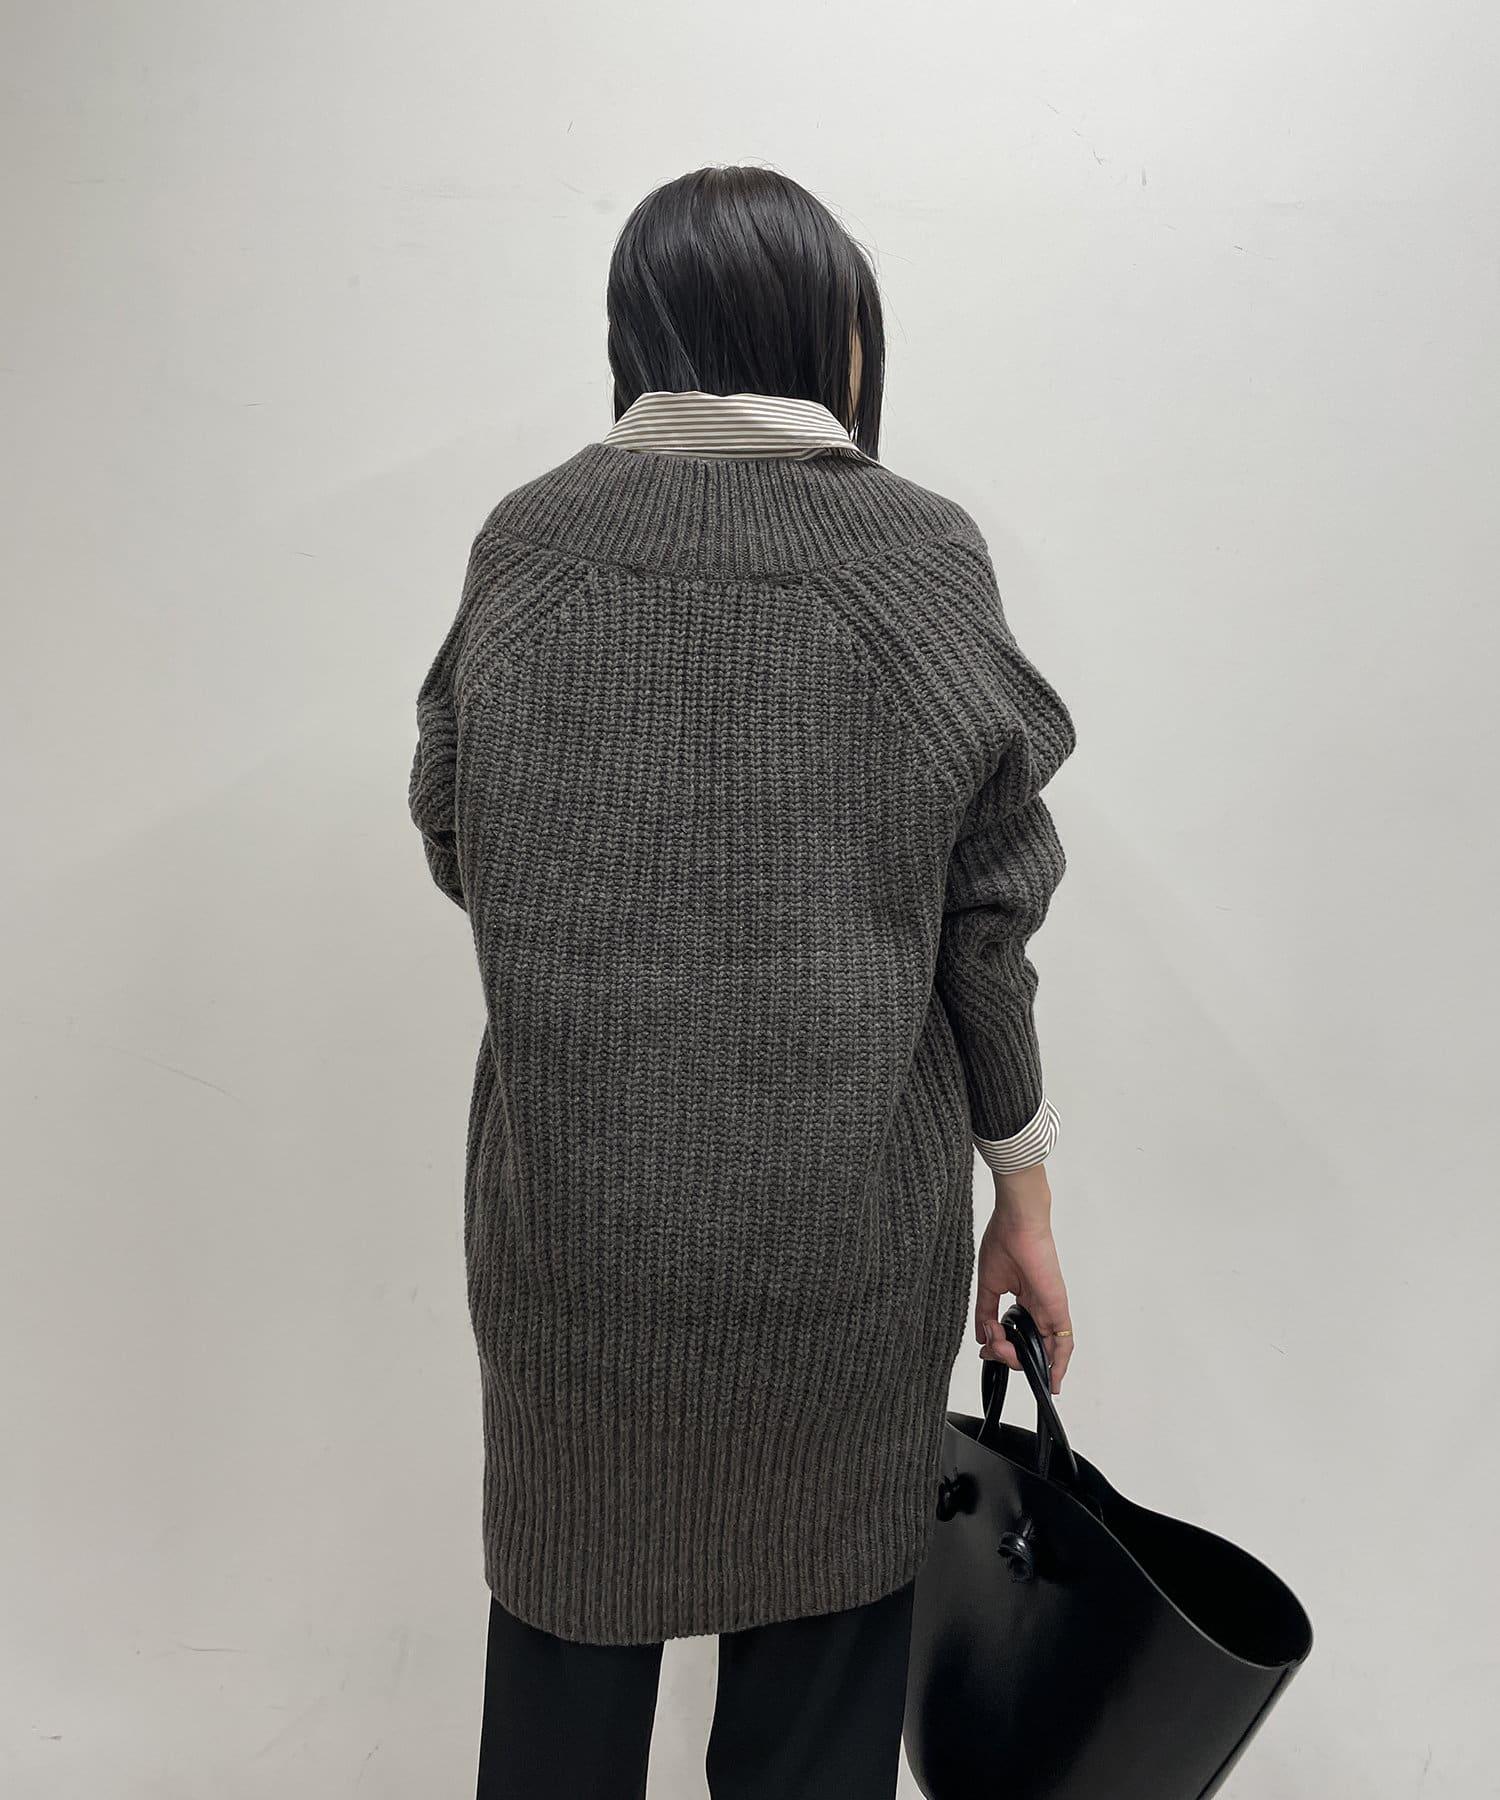 Loungedress(ラウンジドレス) 【TICCA/ティッカ】Vネックチュニック